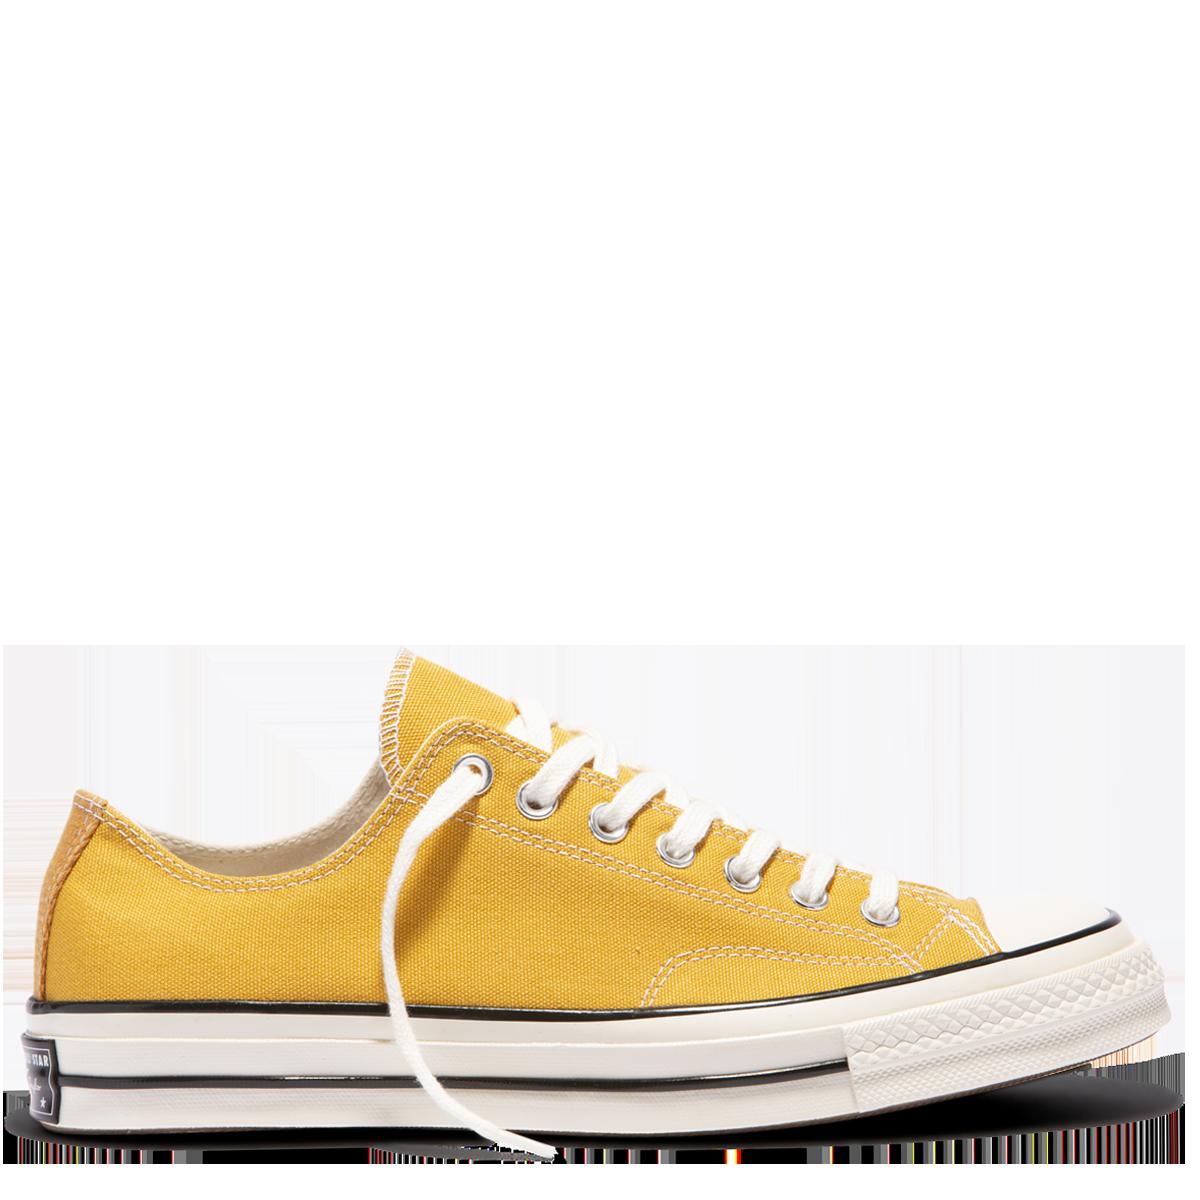 Chuck taylors, Yellow converse, Converse